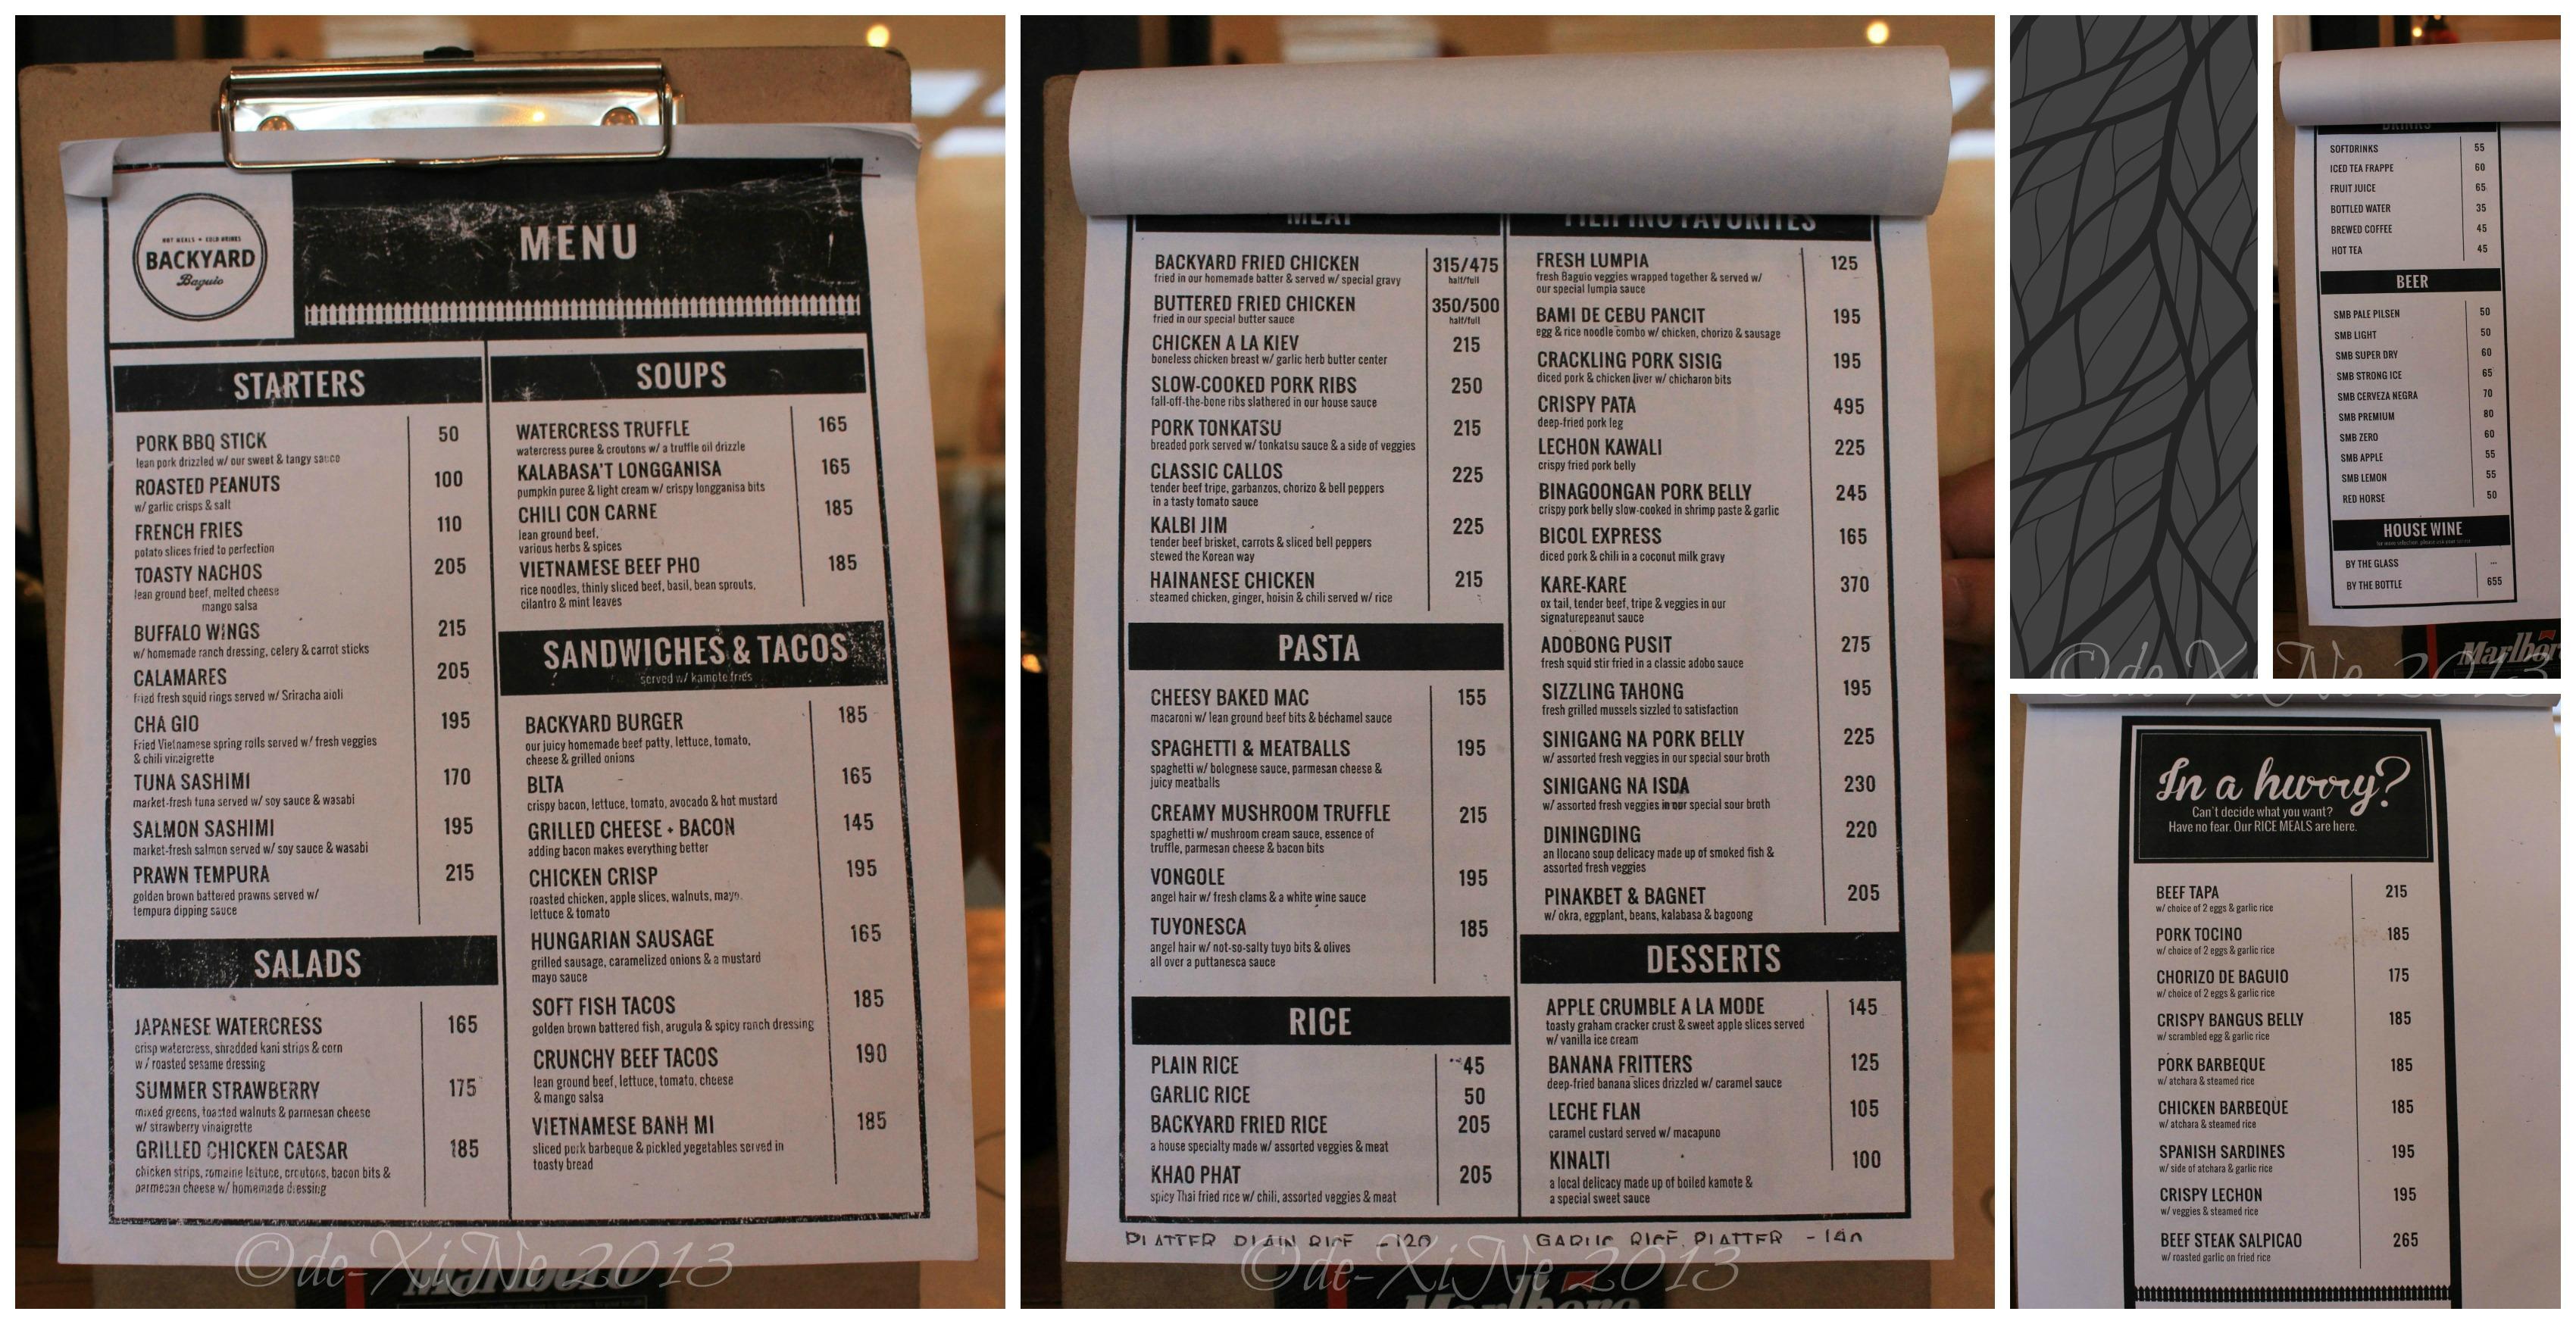 baguio dining a la carte menus menus menus x marks the spot